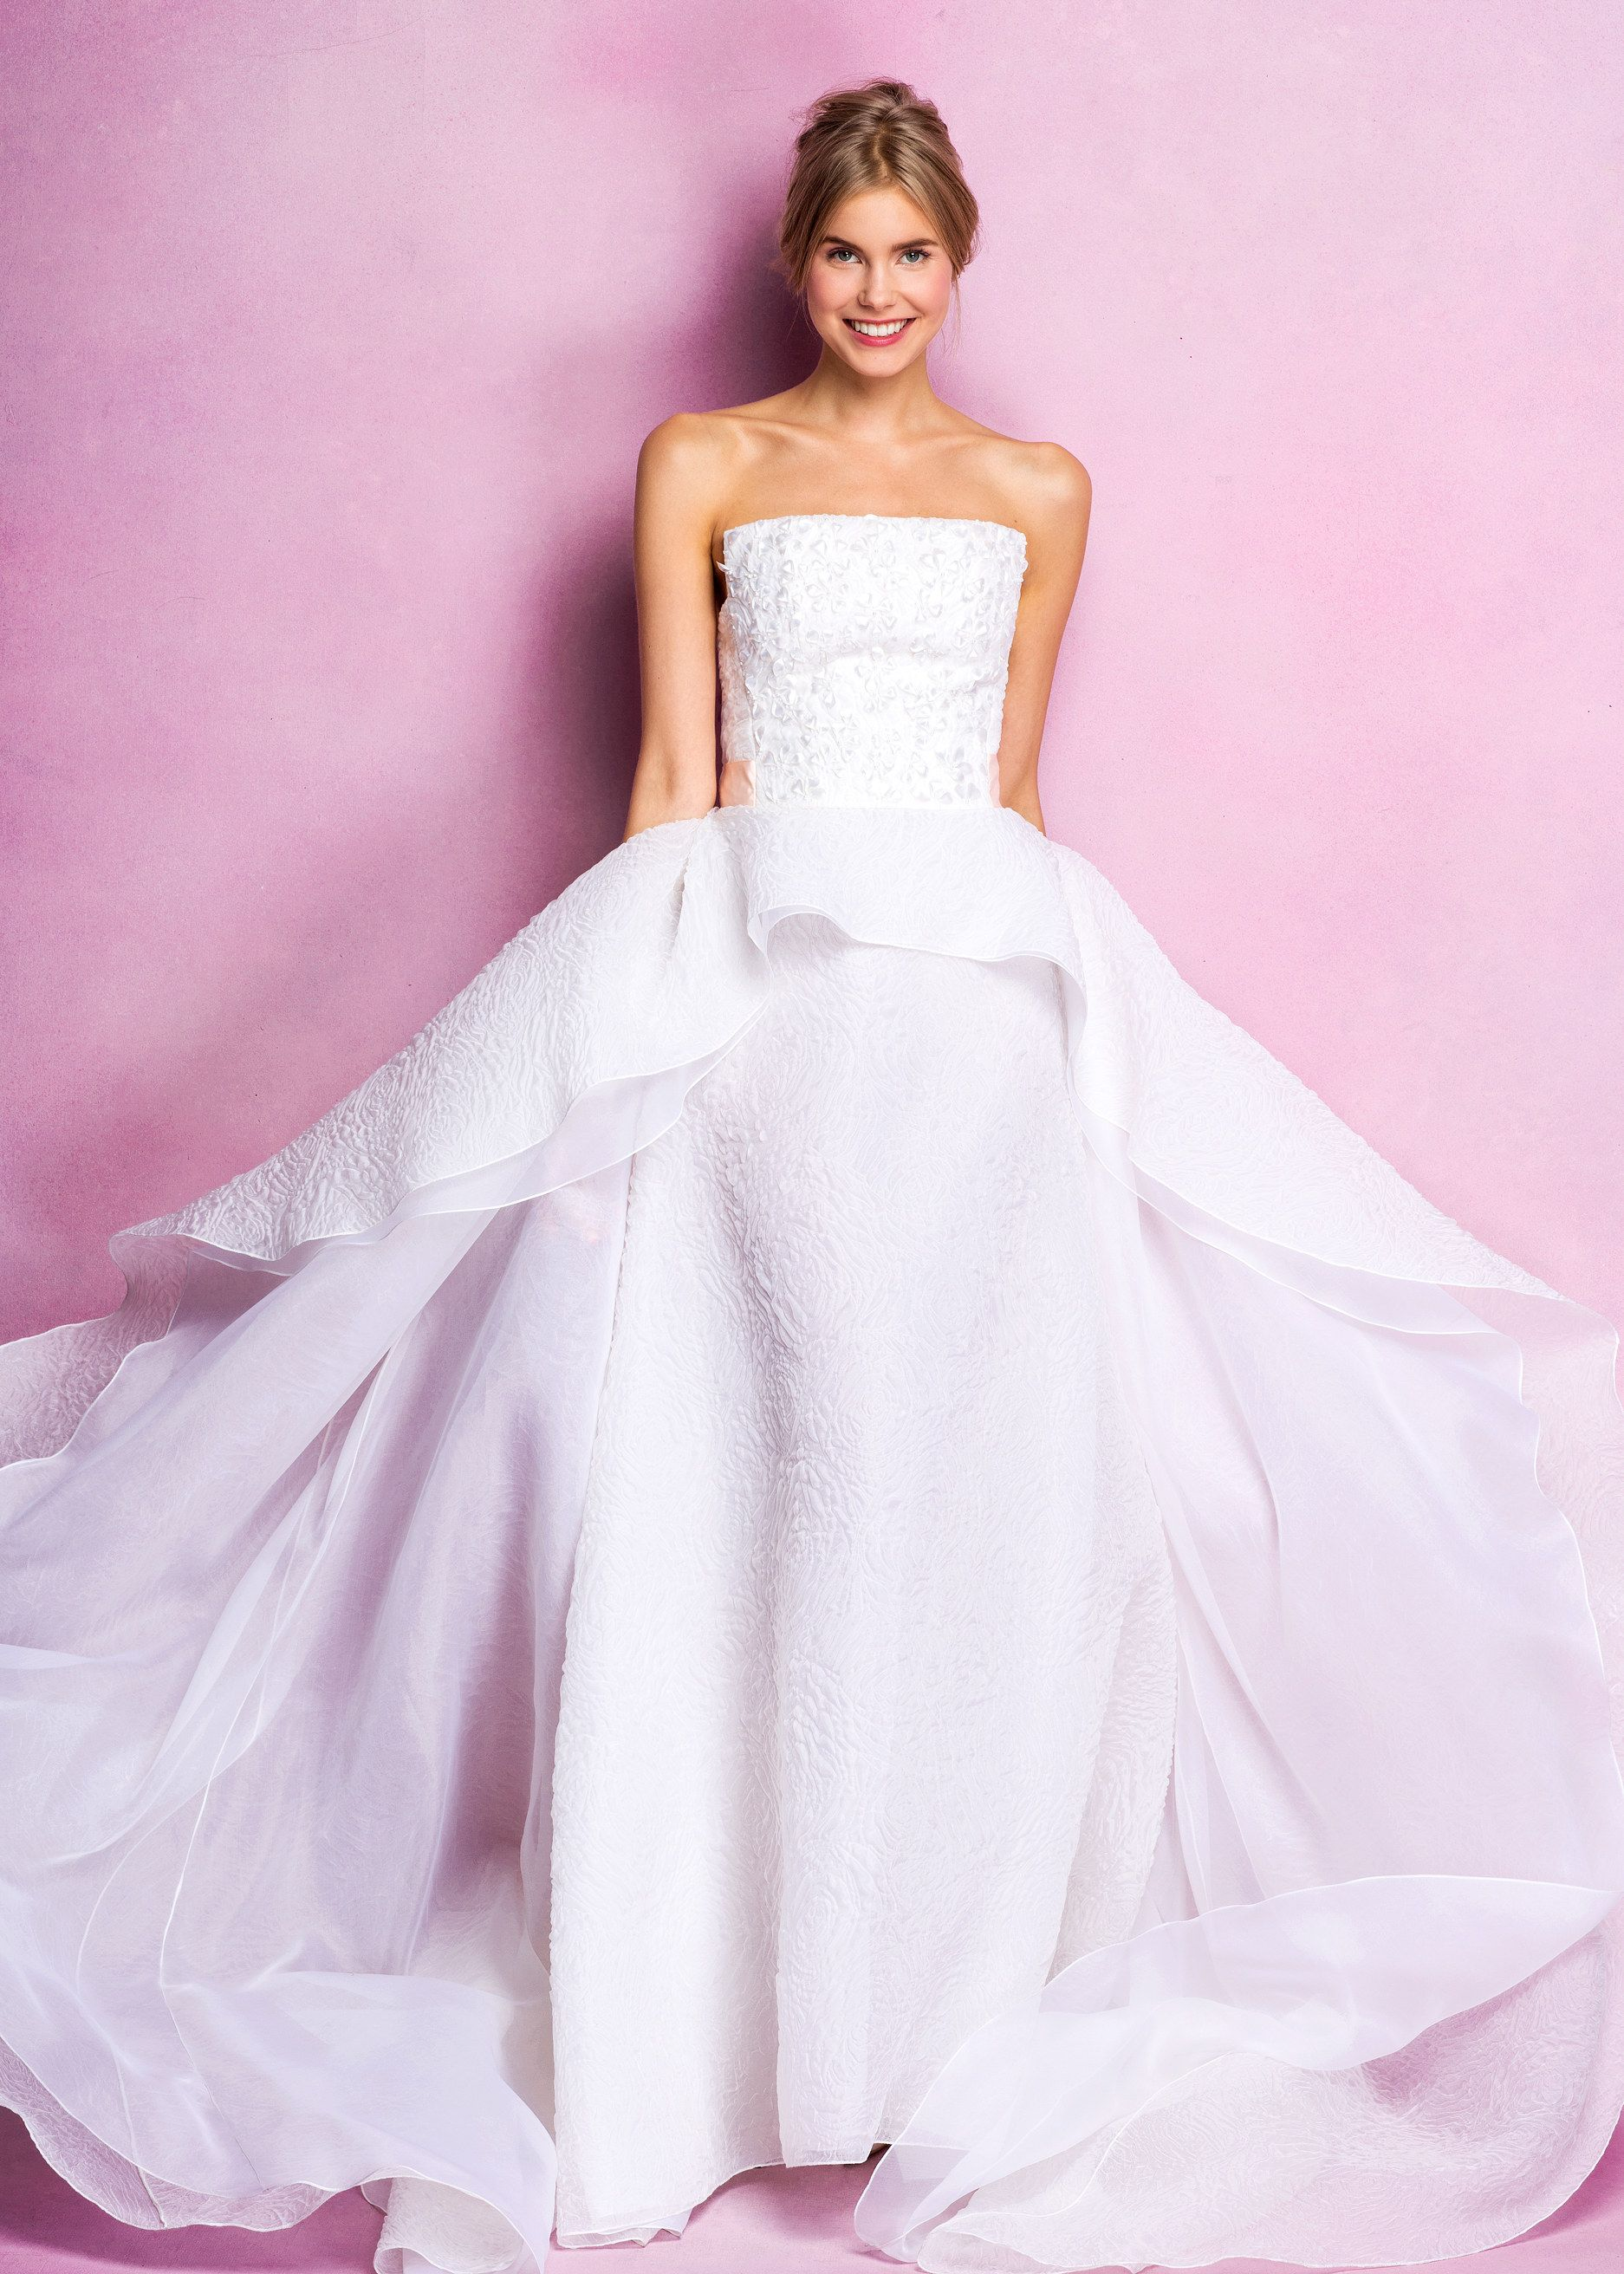 Angel Sanchez Bridal Fall 2016 Fashion Show | Pinterest | Boda